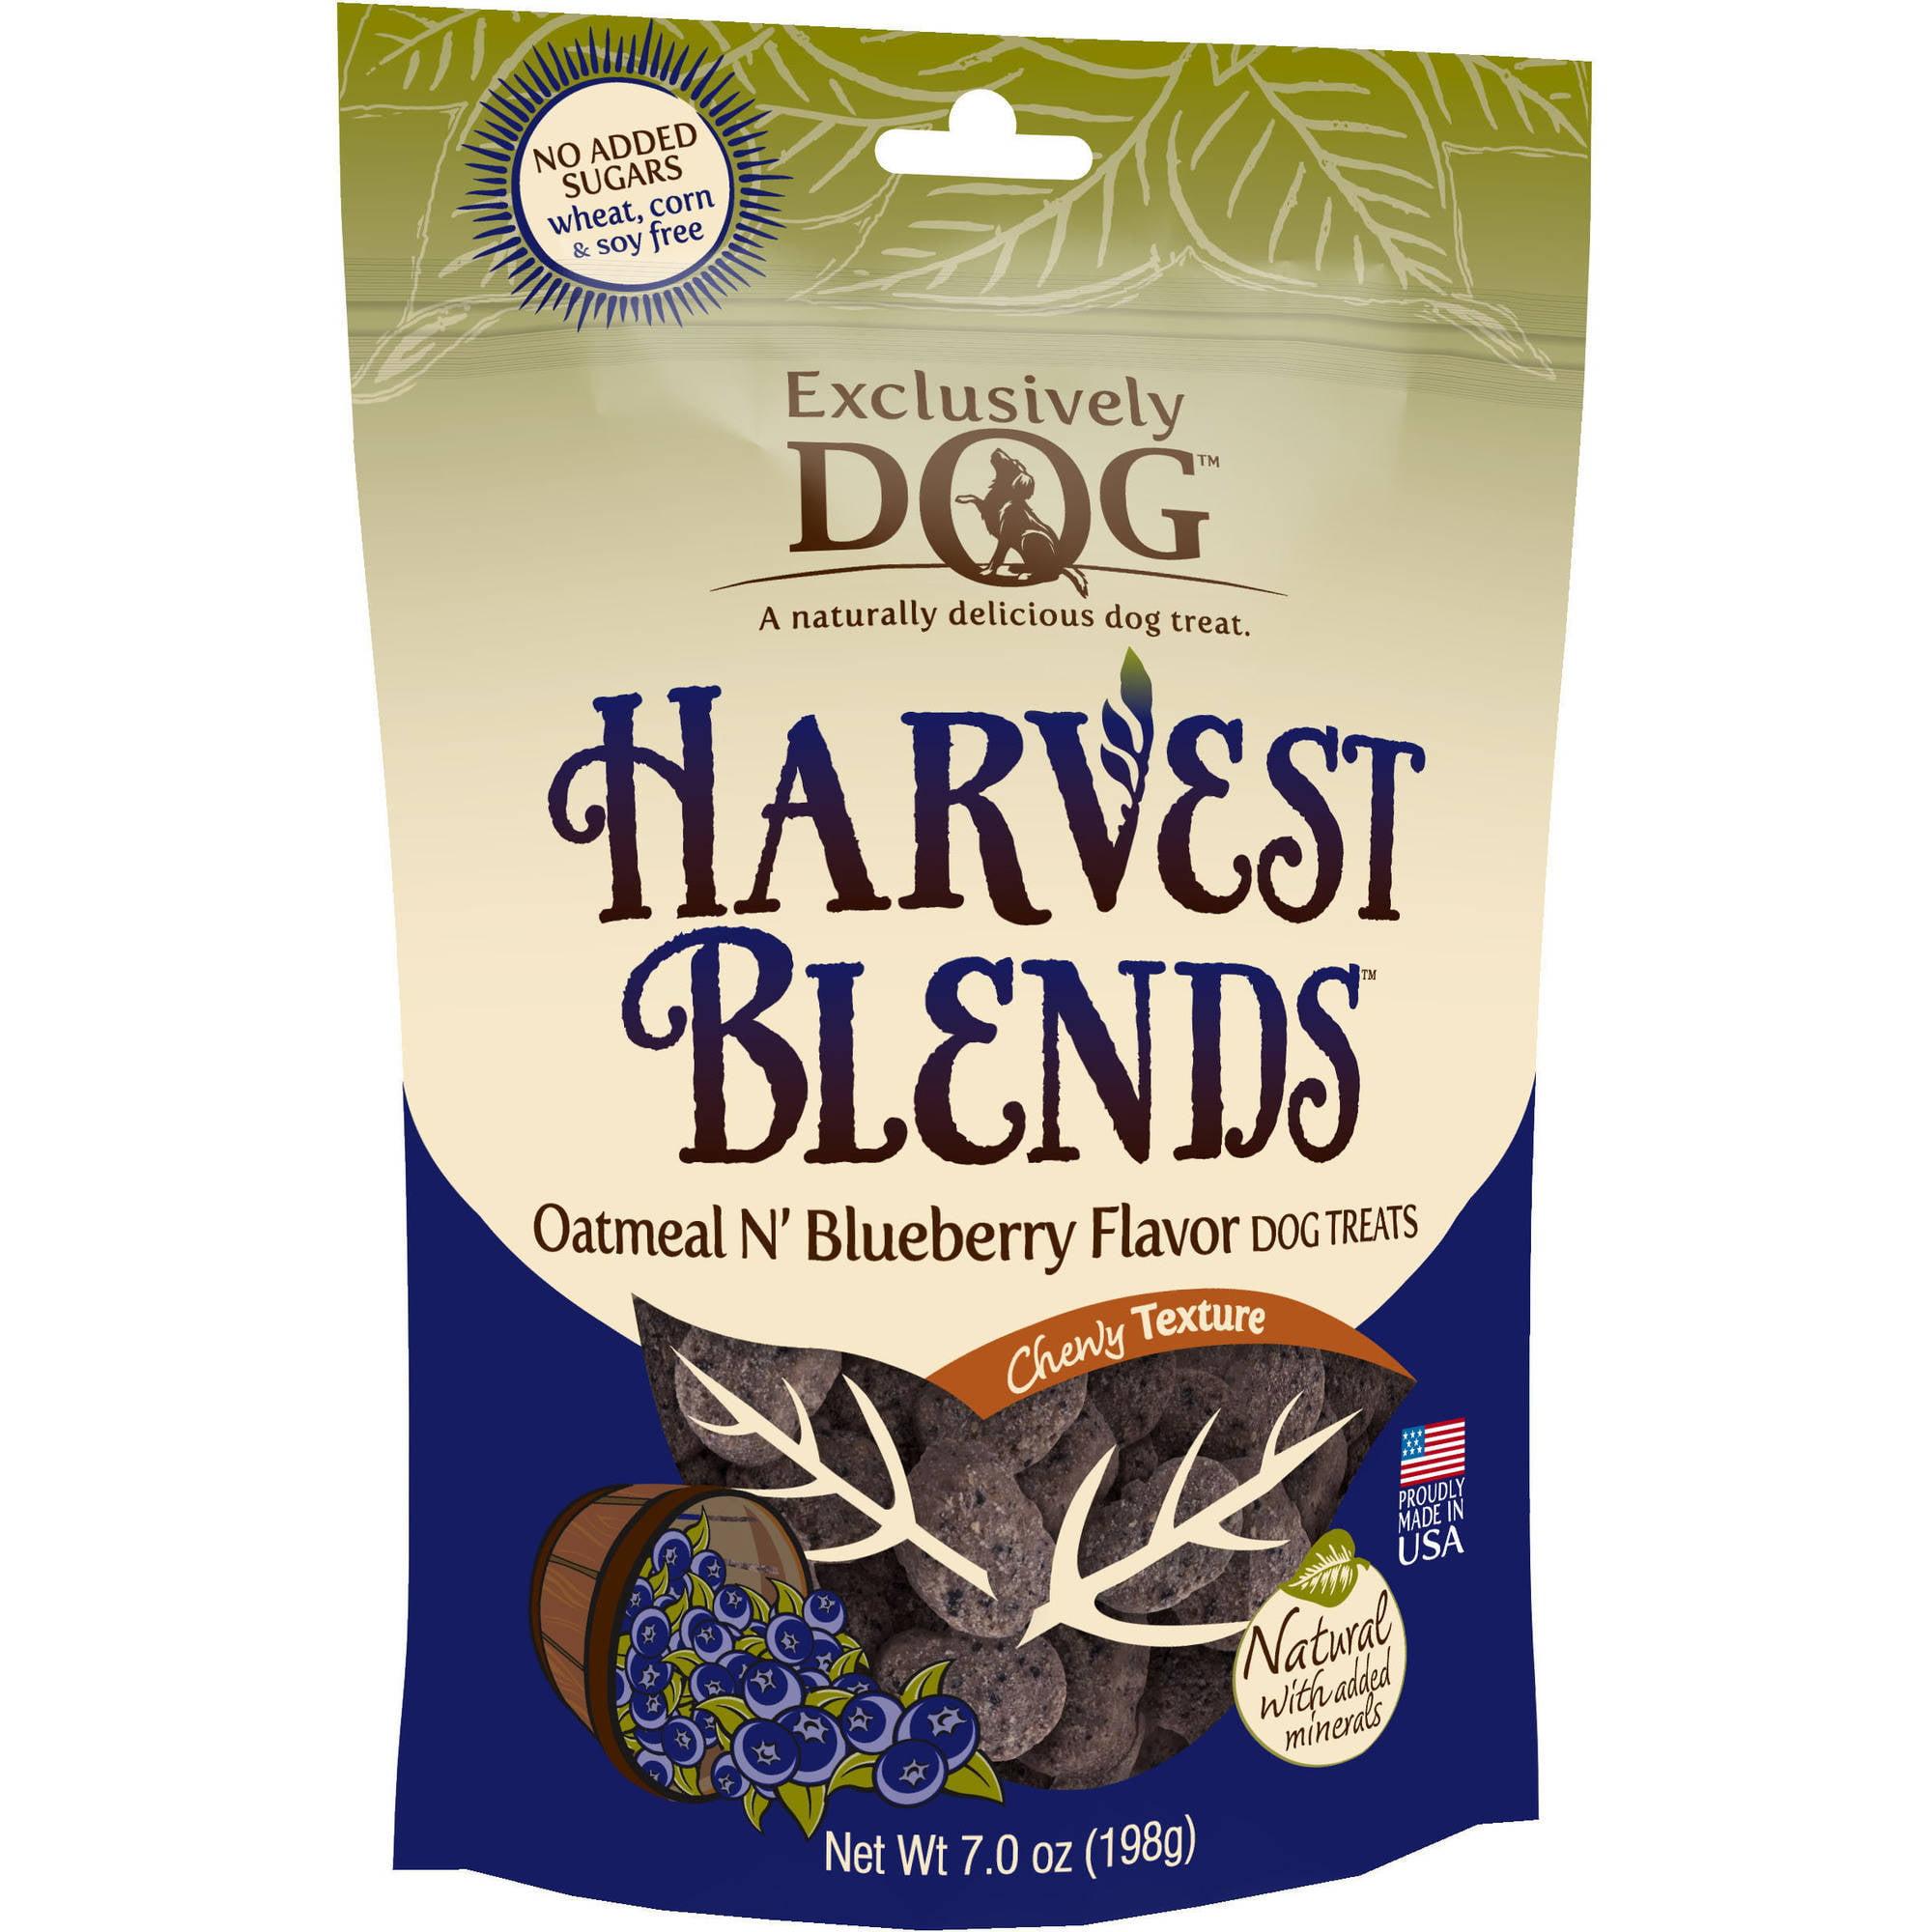 Harvest Blends, Oatmeal N' Blueberry